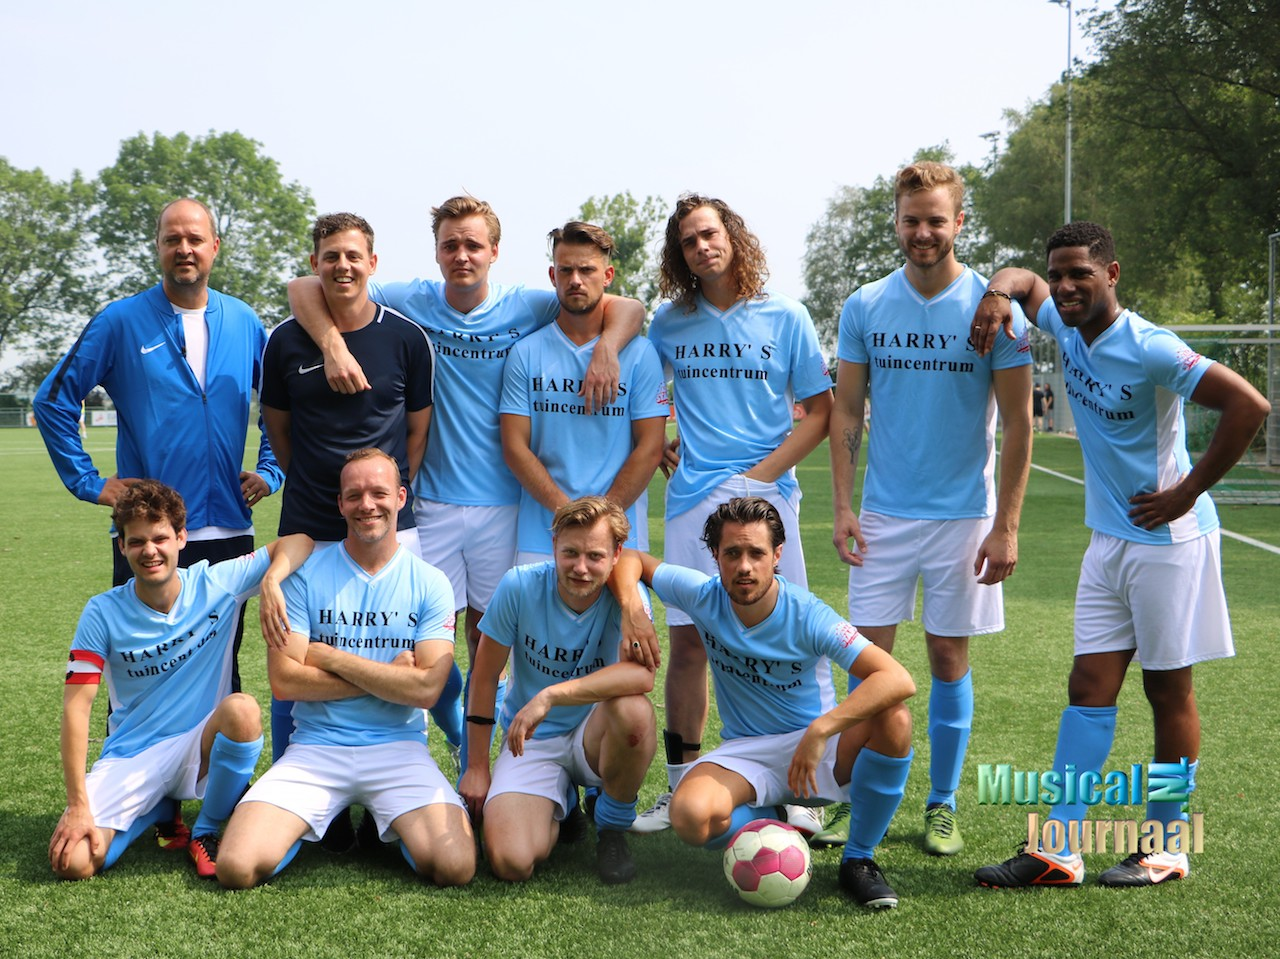 All Stars cast wint allereerste All Stars Voetbaltoernooi!